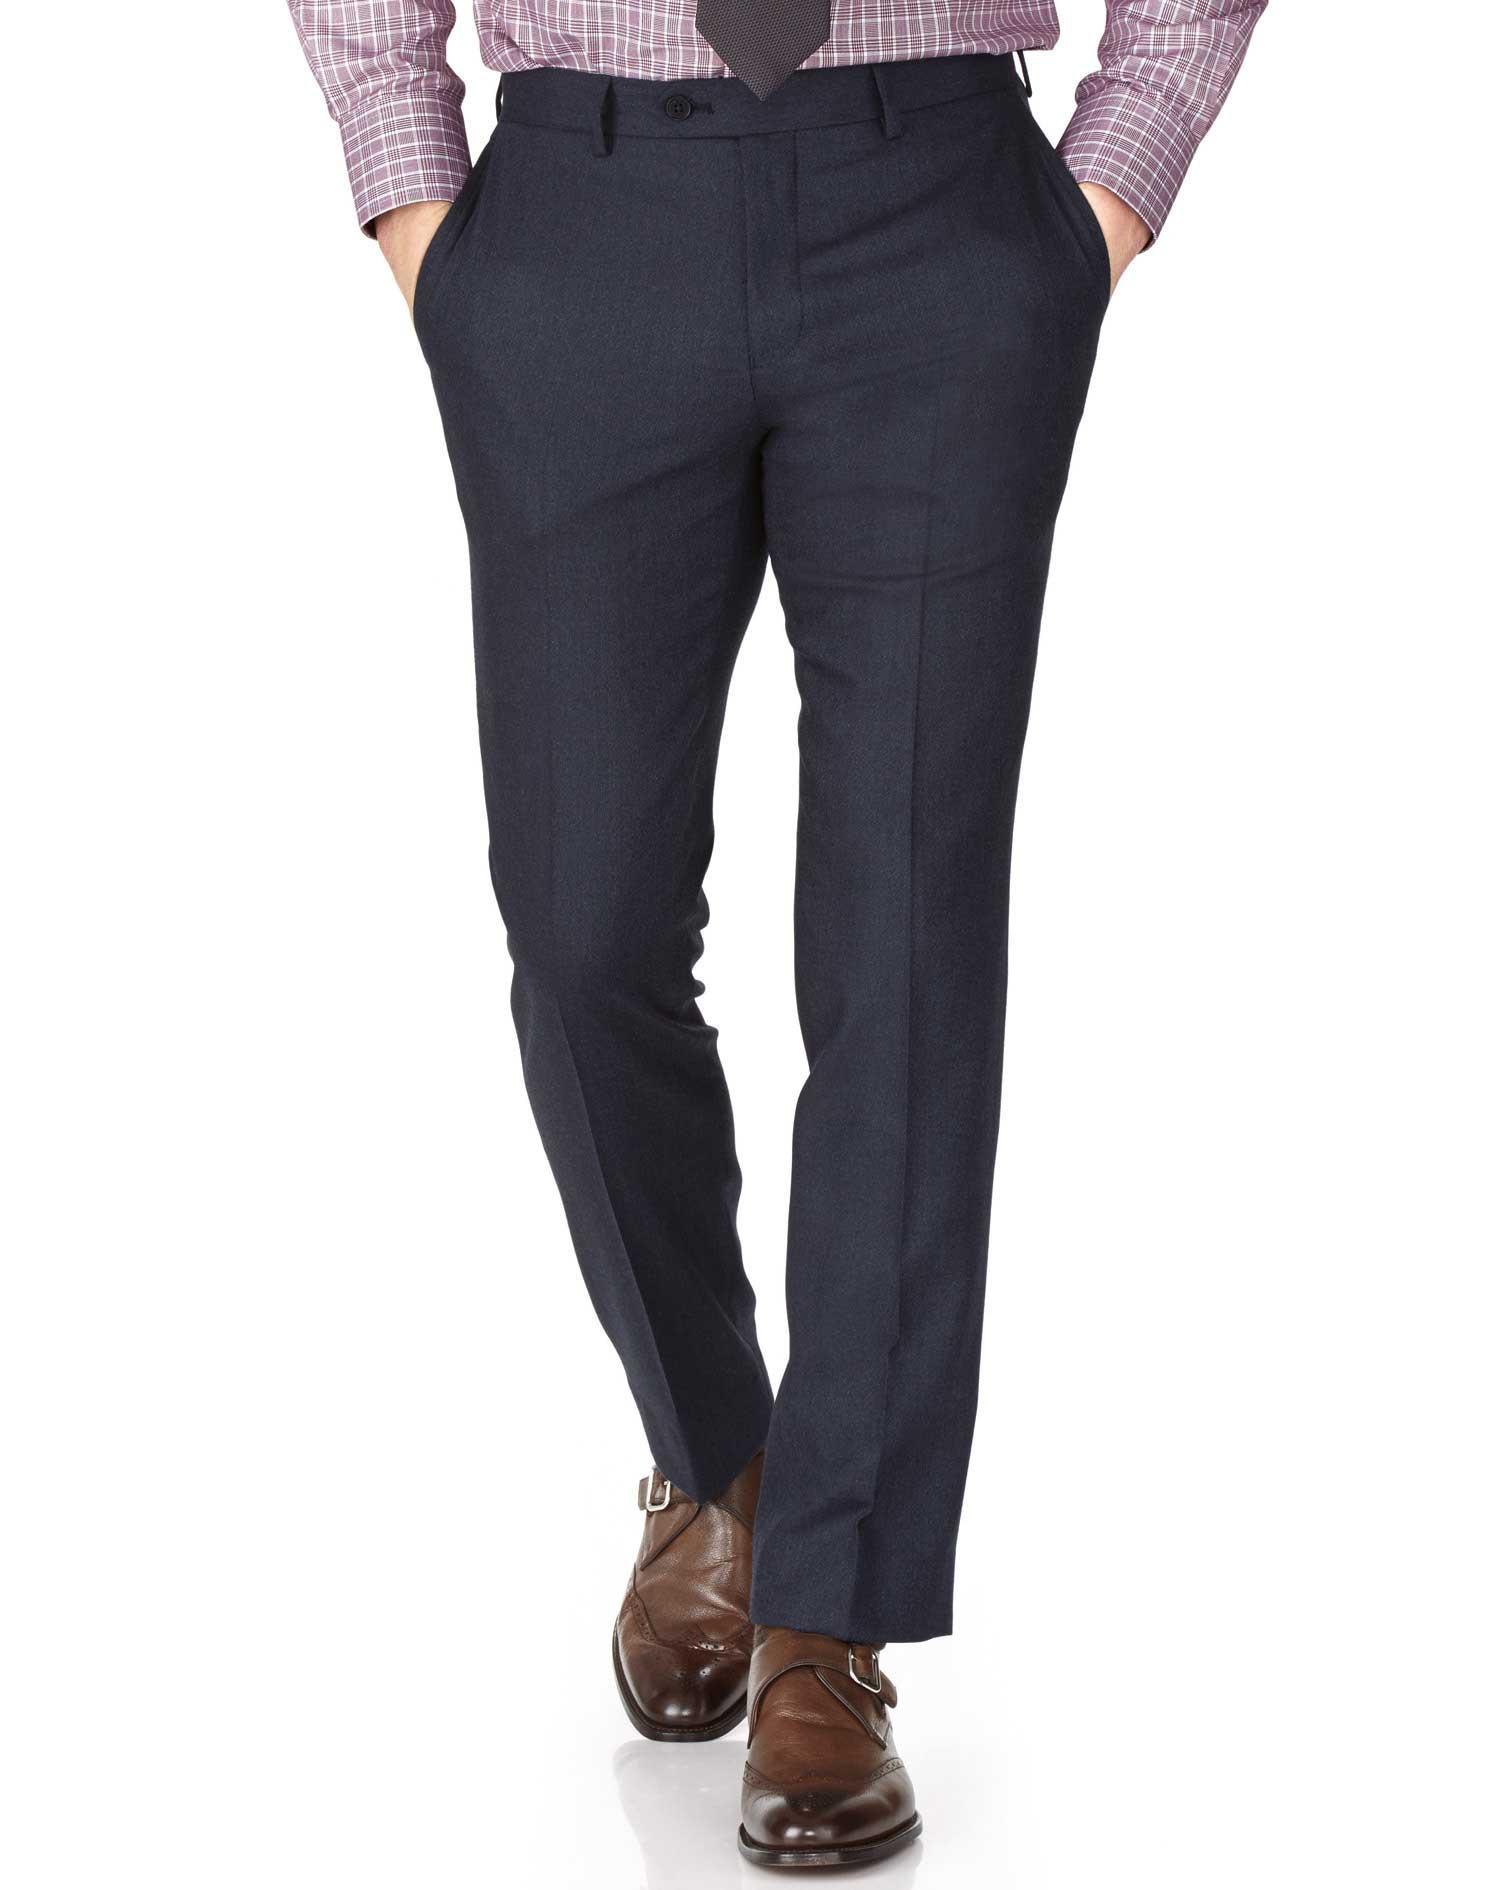 Indigo Slim Fit Saxony Business Suit Trousers Size W40 L38 by Charles Tyrwhitt